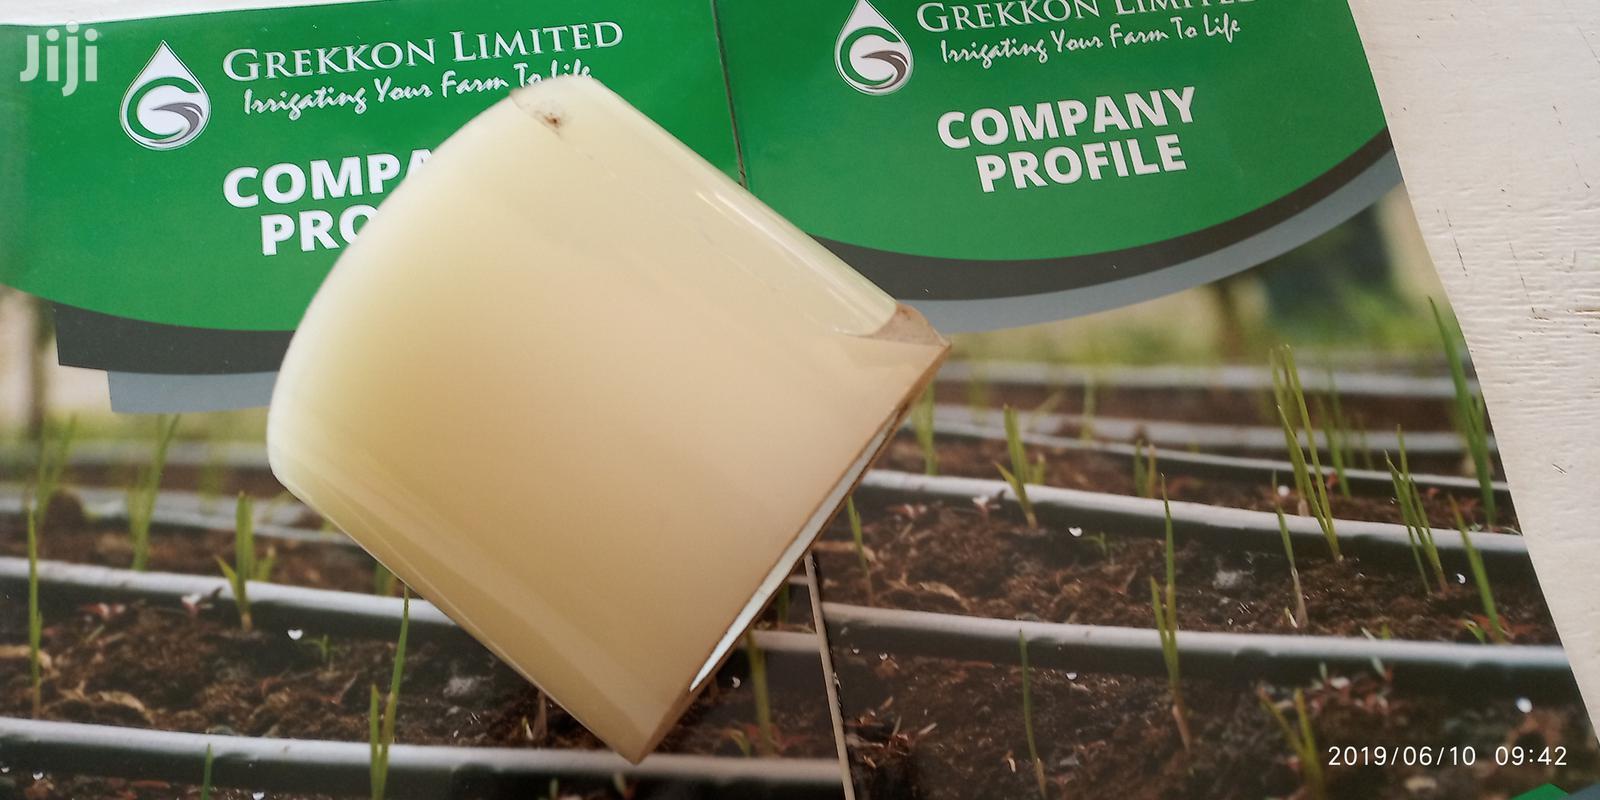 Greenhouse Repair Tape | GREKKON LIMITED